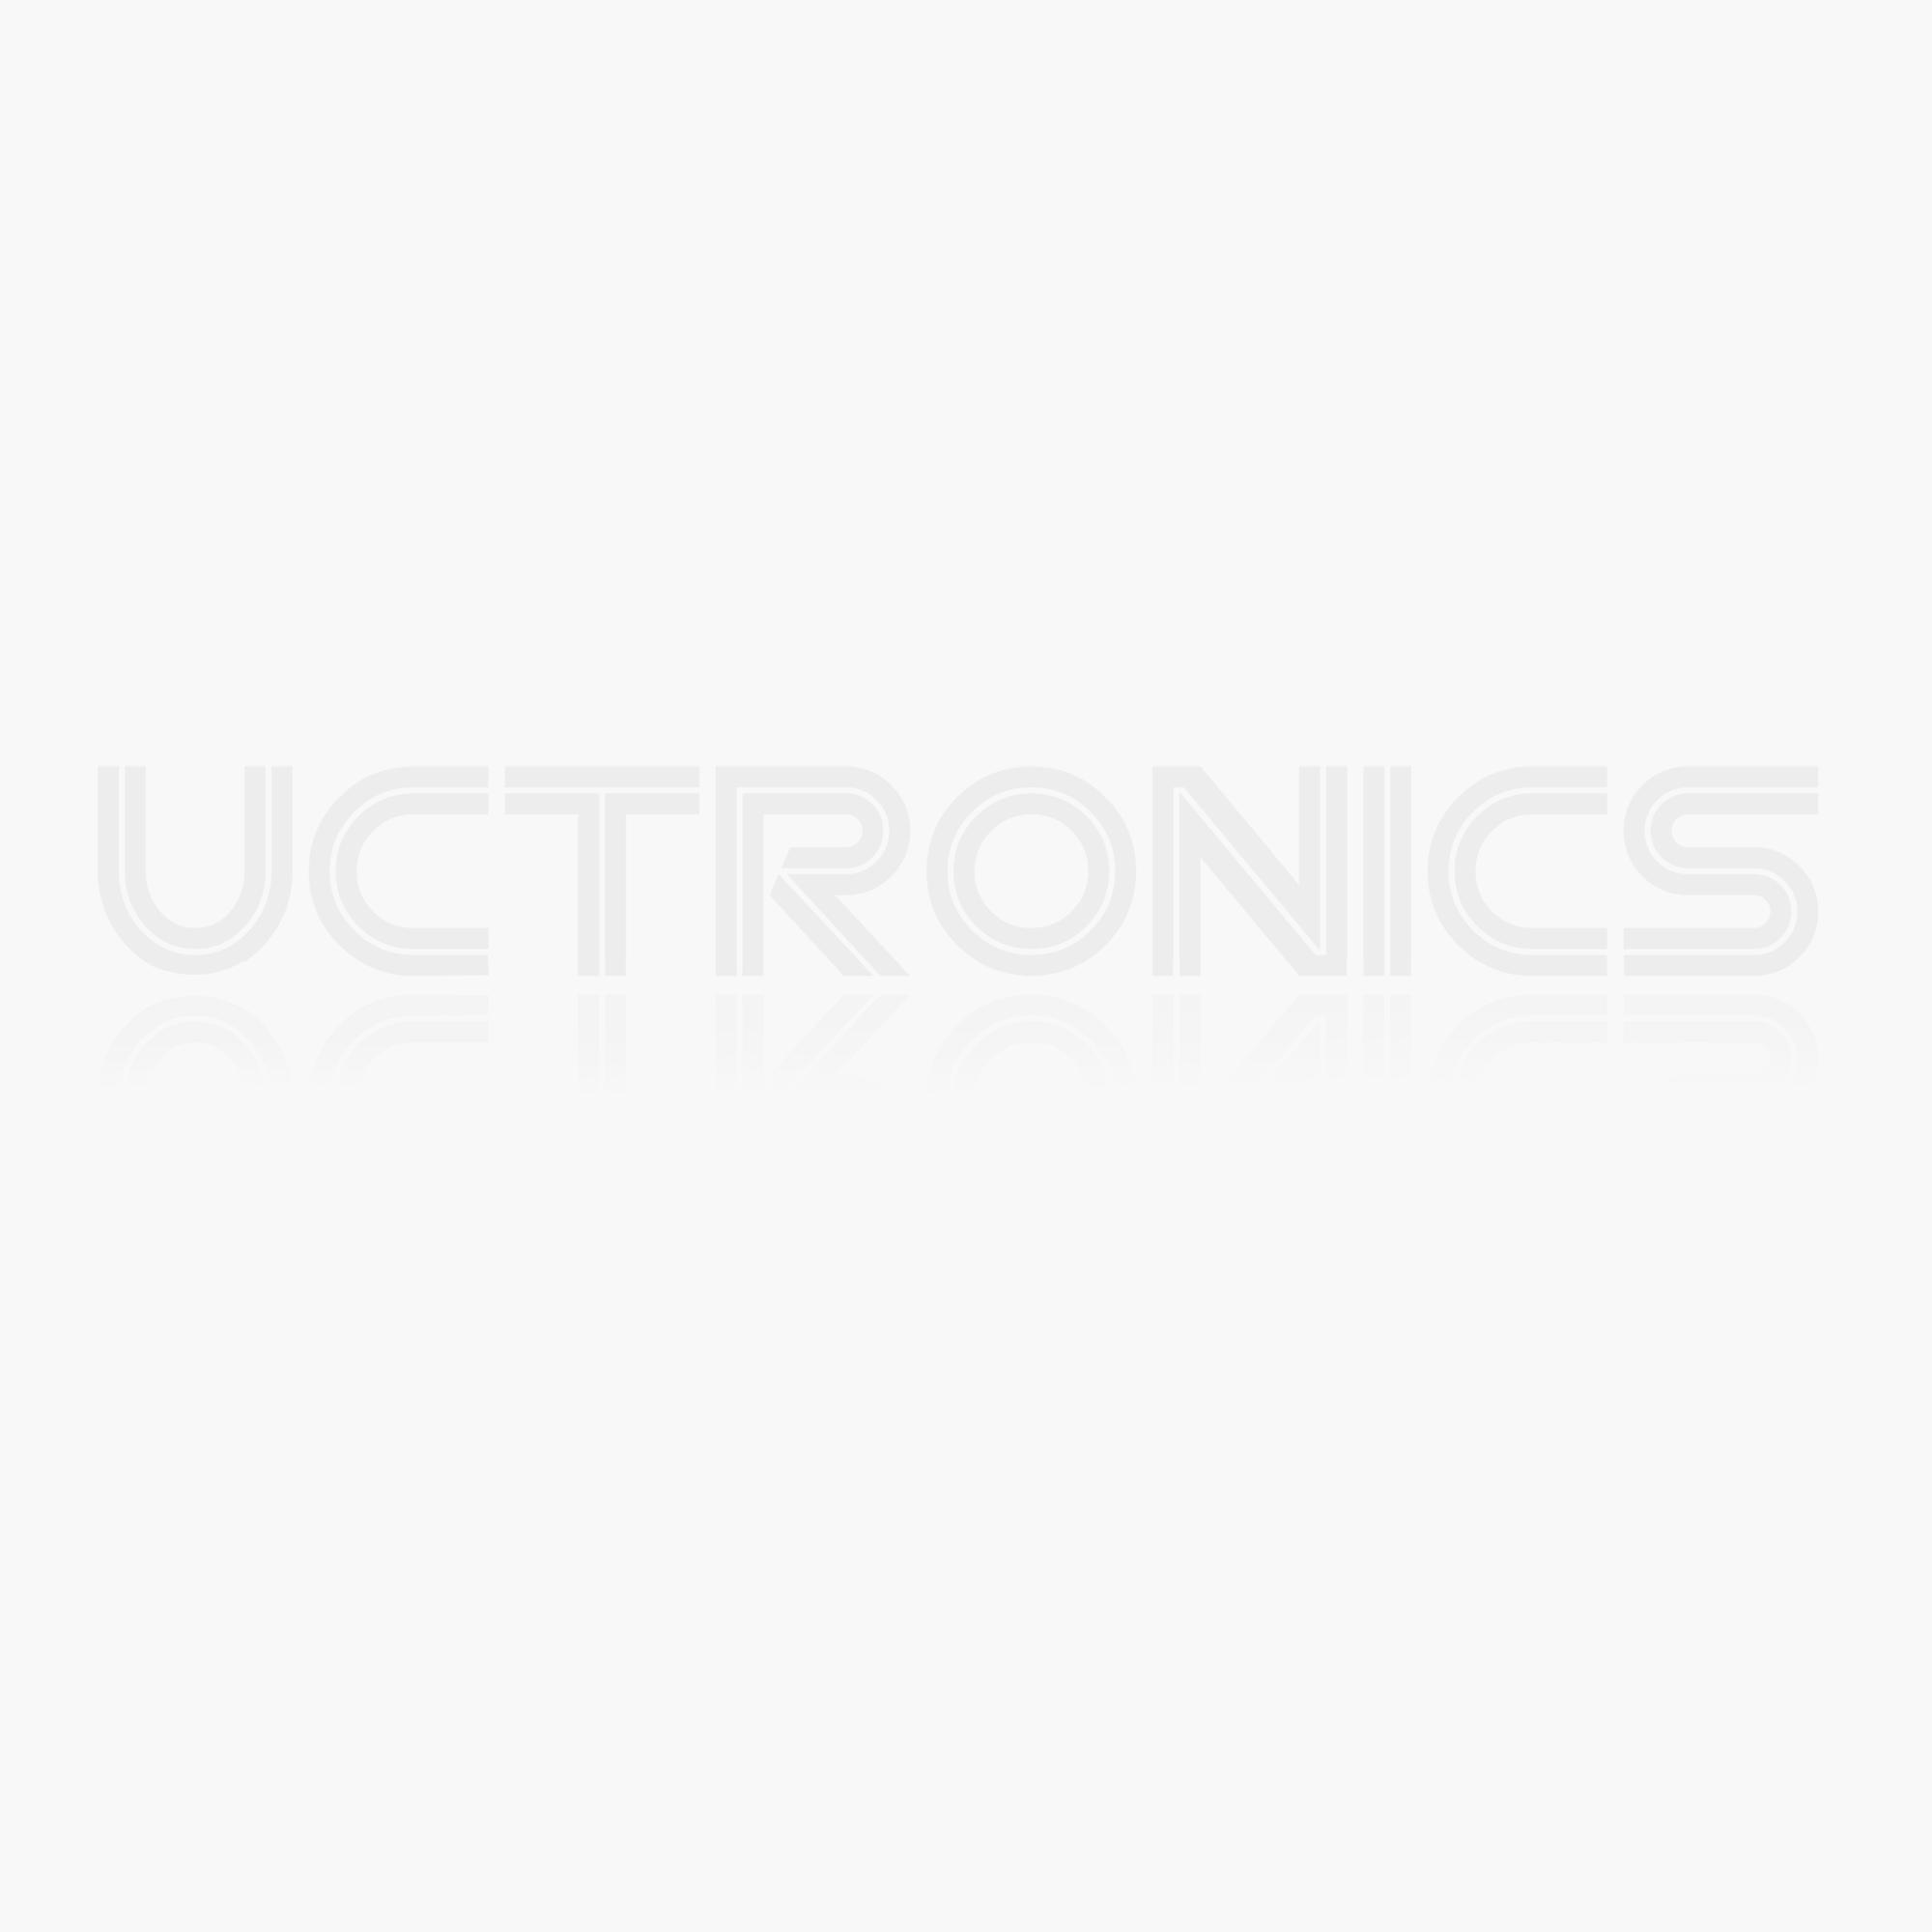 10 pcs 5V Active Buzzer Magnetic Long Continous Beep Alarm Ringer 12095 Type